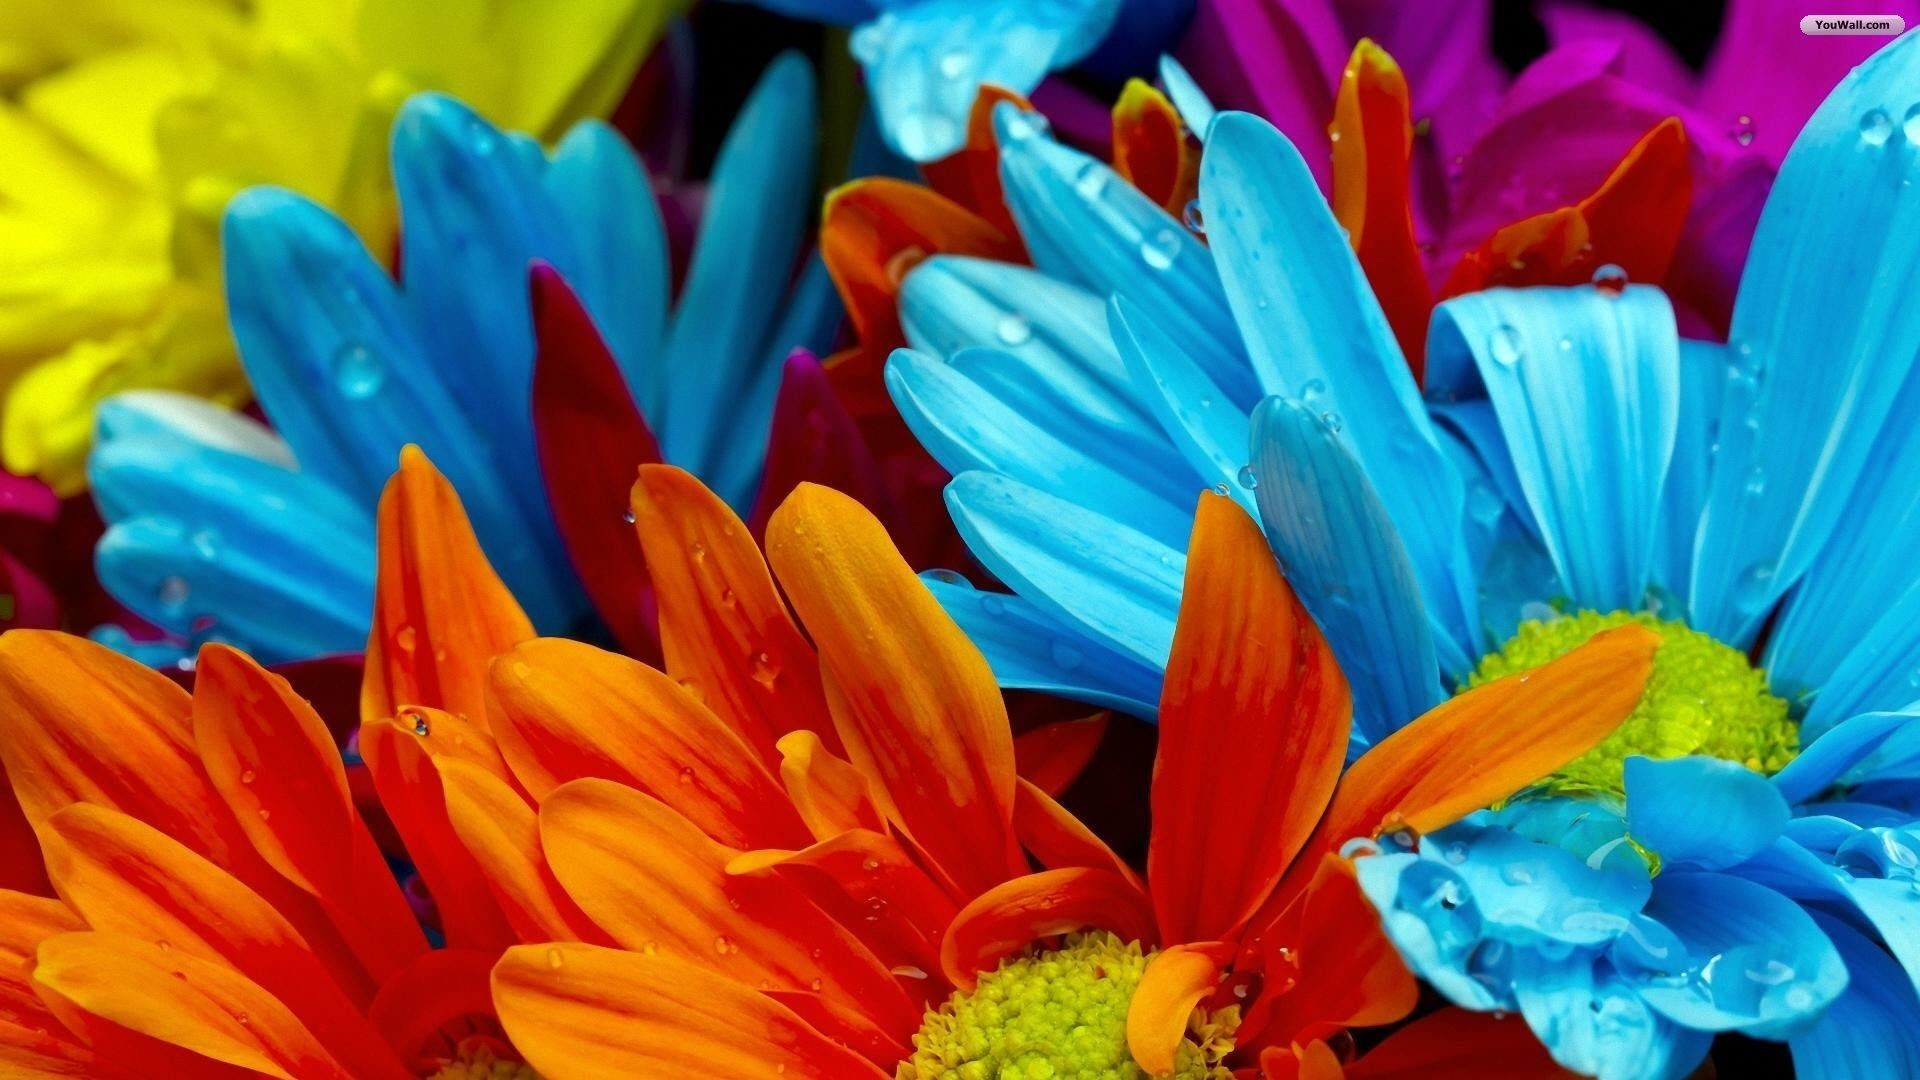 Res: 1920x1080, 7. summer-flowers-wallpaper7-2-600x338